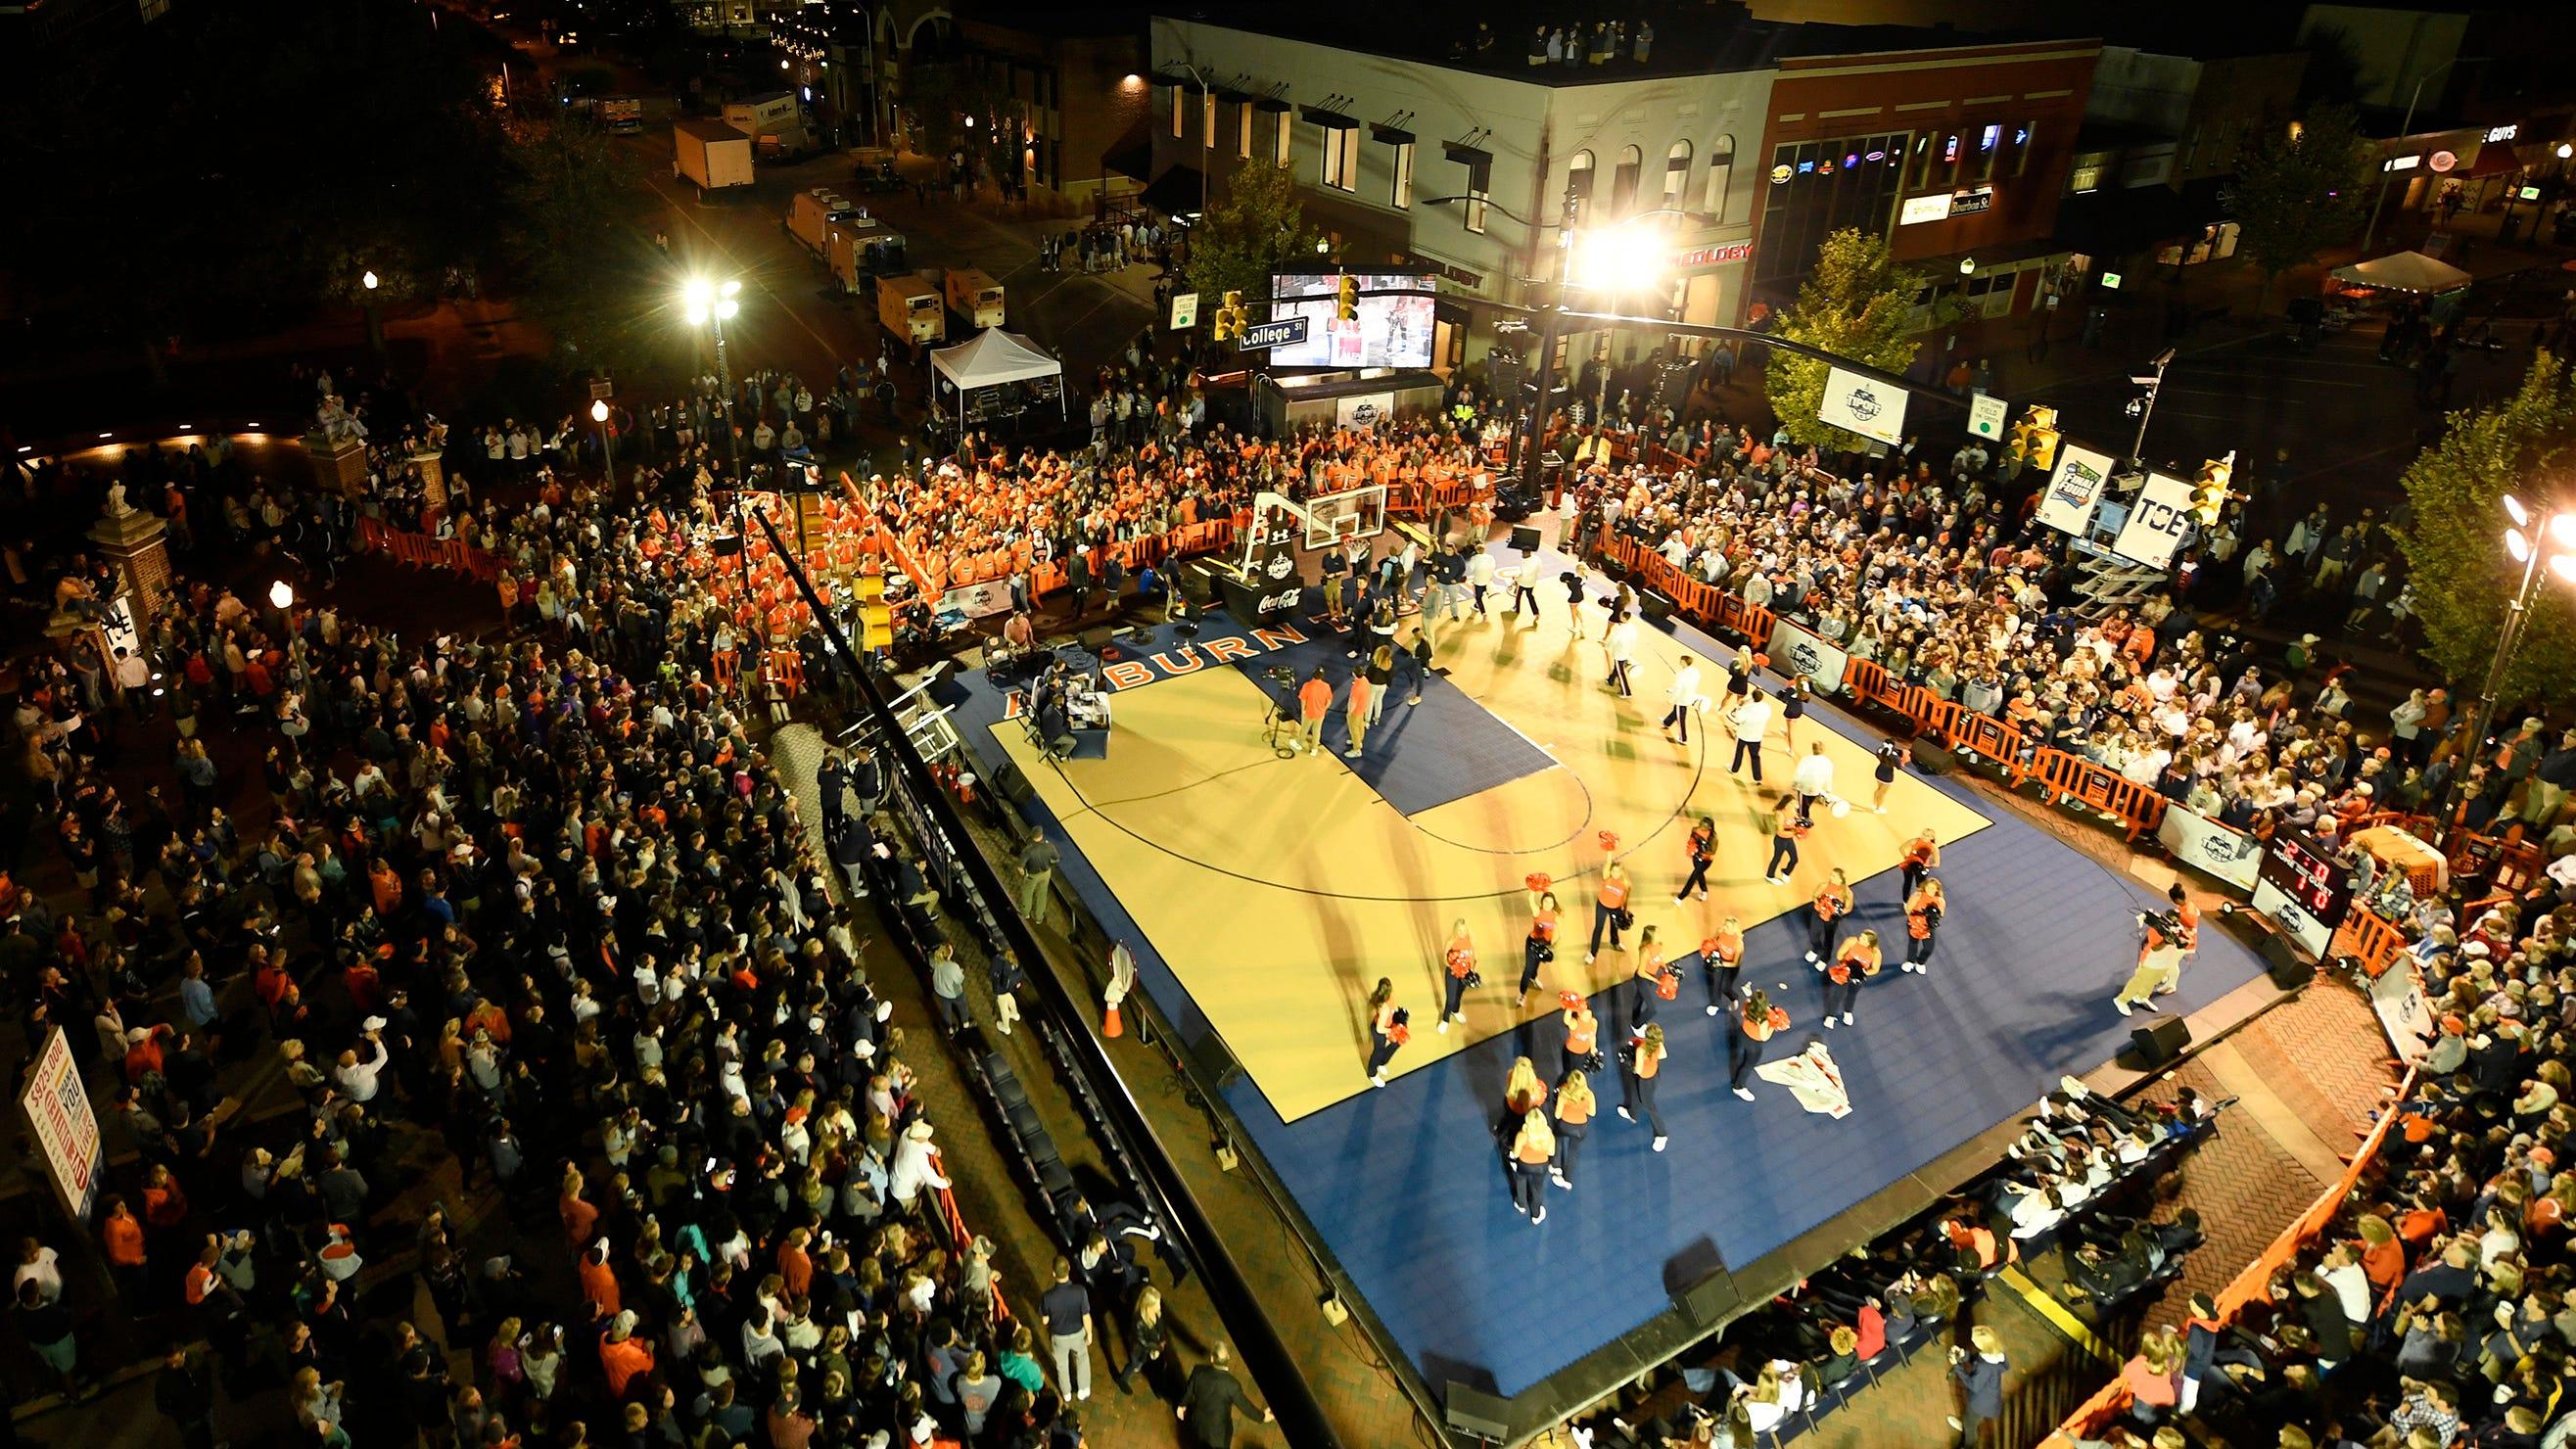 Tipoff at Toomer's showcases Auburn basketball